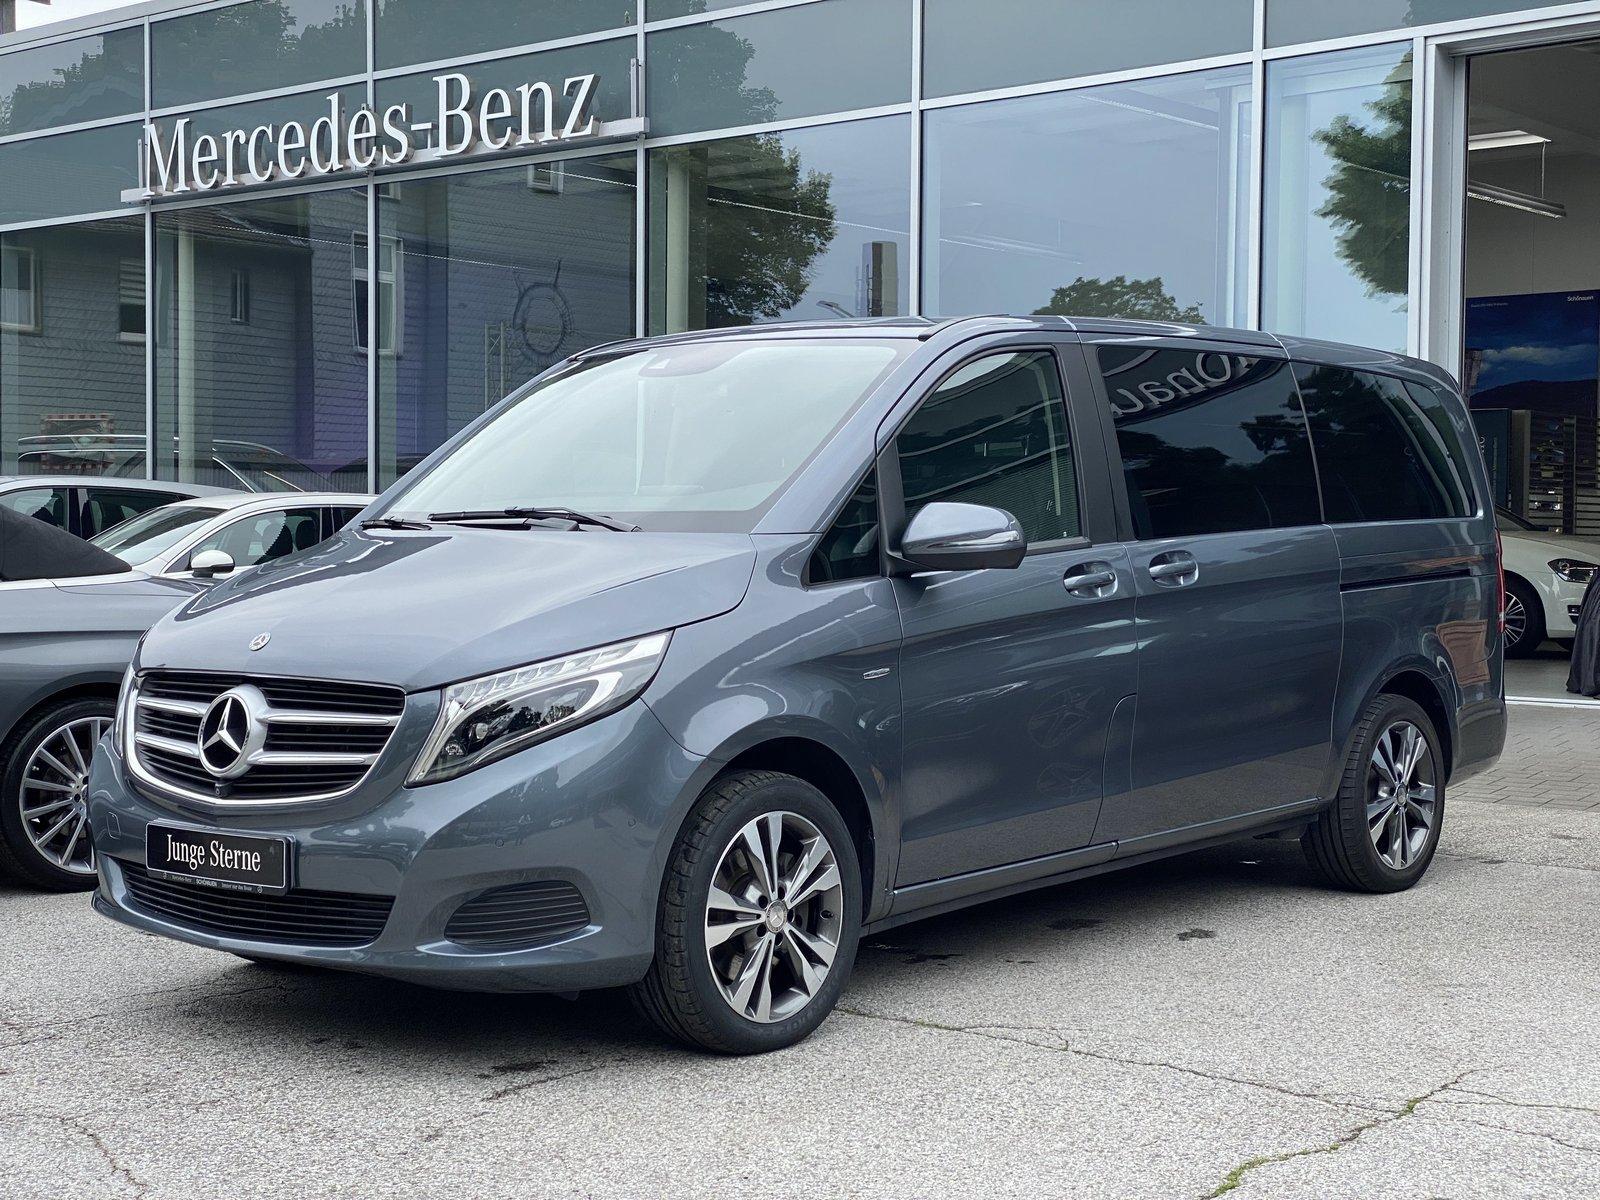 Mercedes-Benz V 250d 4M Avantgarde Edit. COMAND+STDHZ+AHK+360, Jahr 2017, Diesel